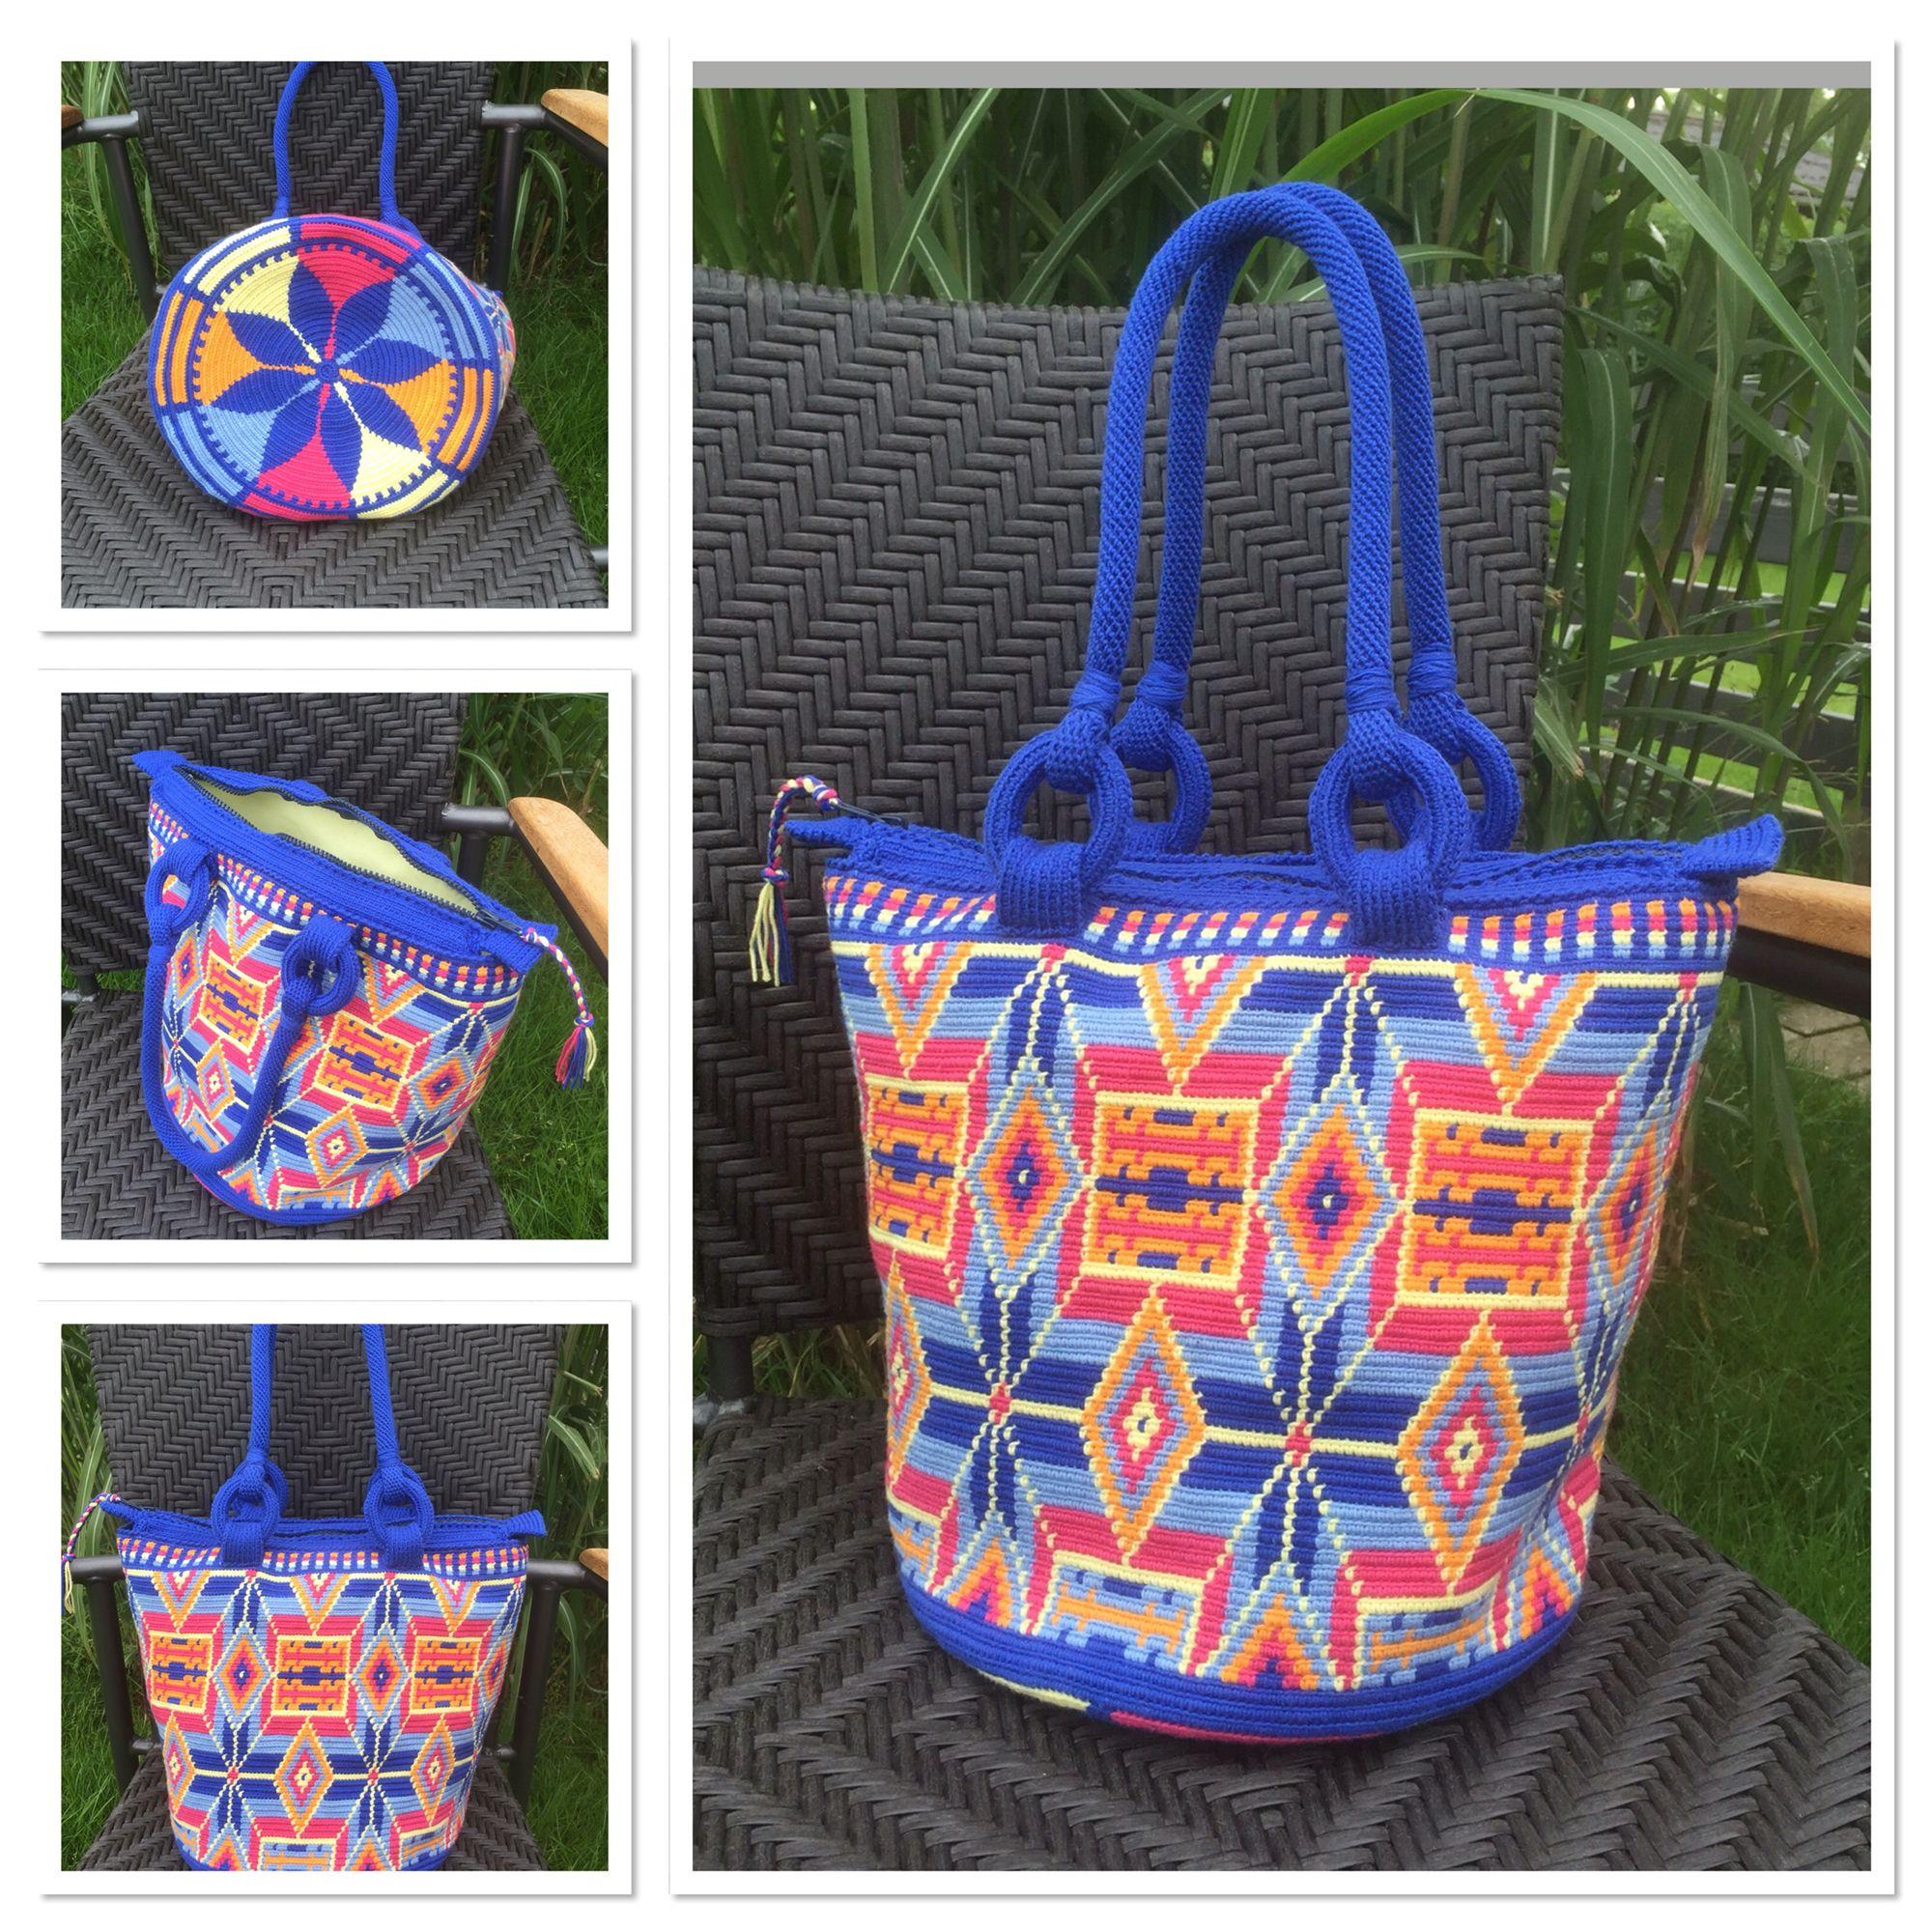 Crocheted bag size XL   Mochilas   Pinterest   Tasche häkeln, Häkeln ...